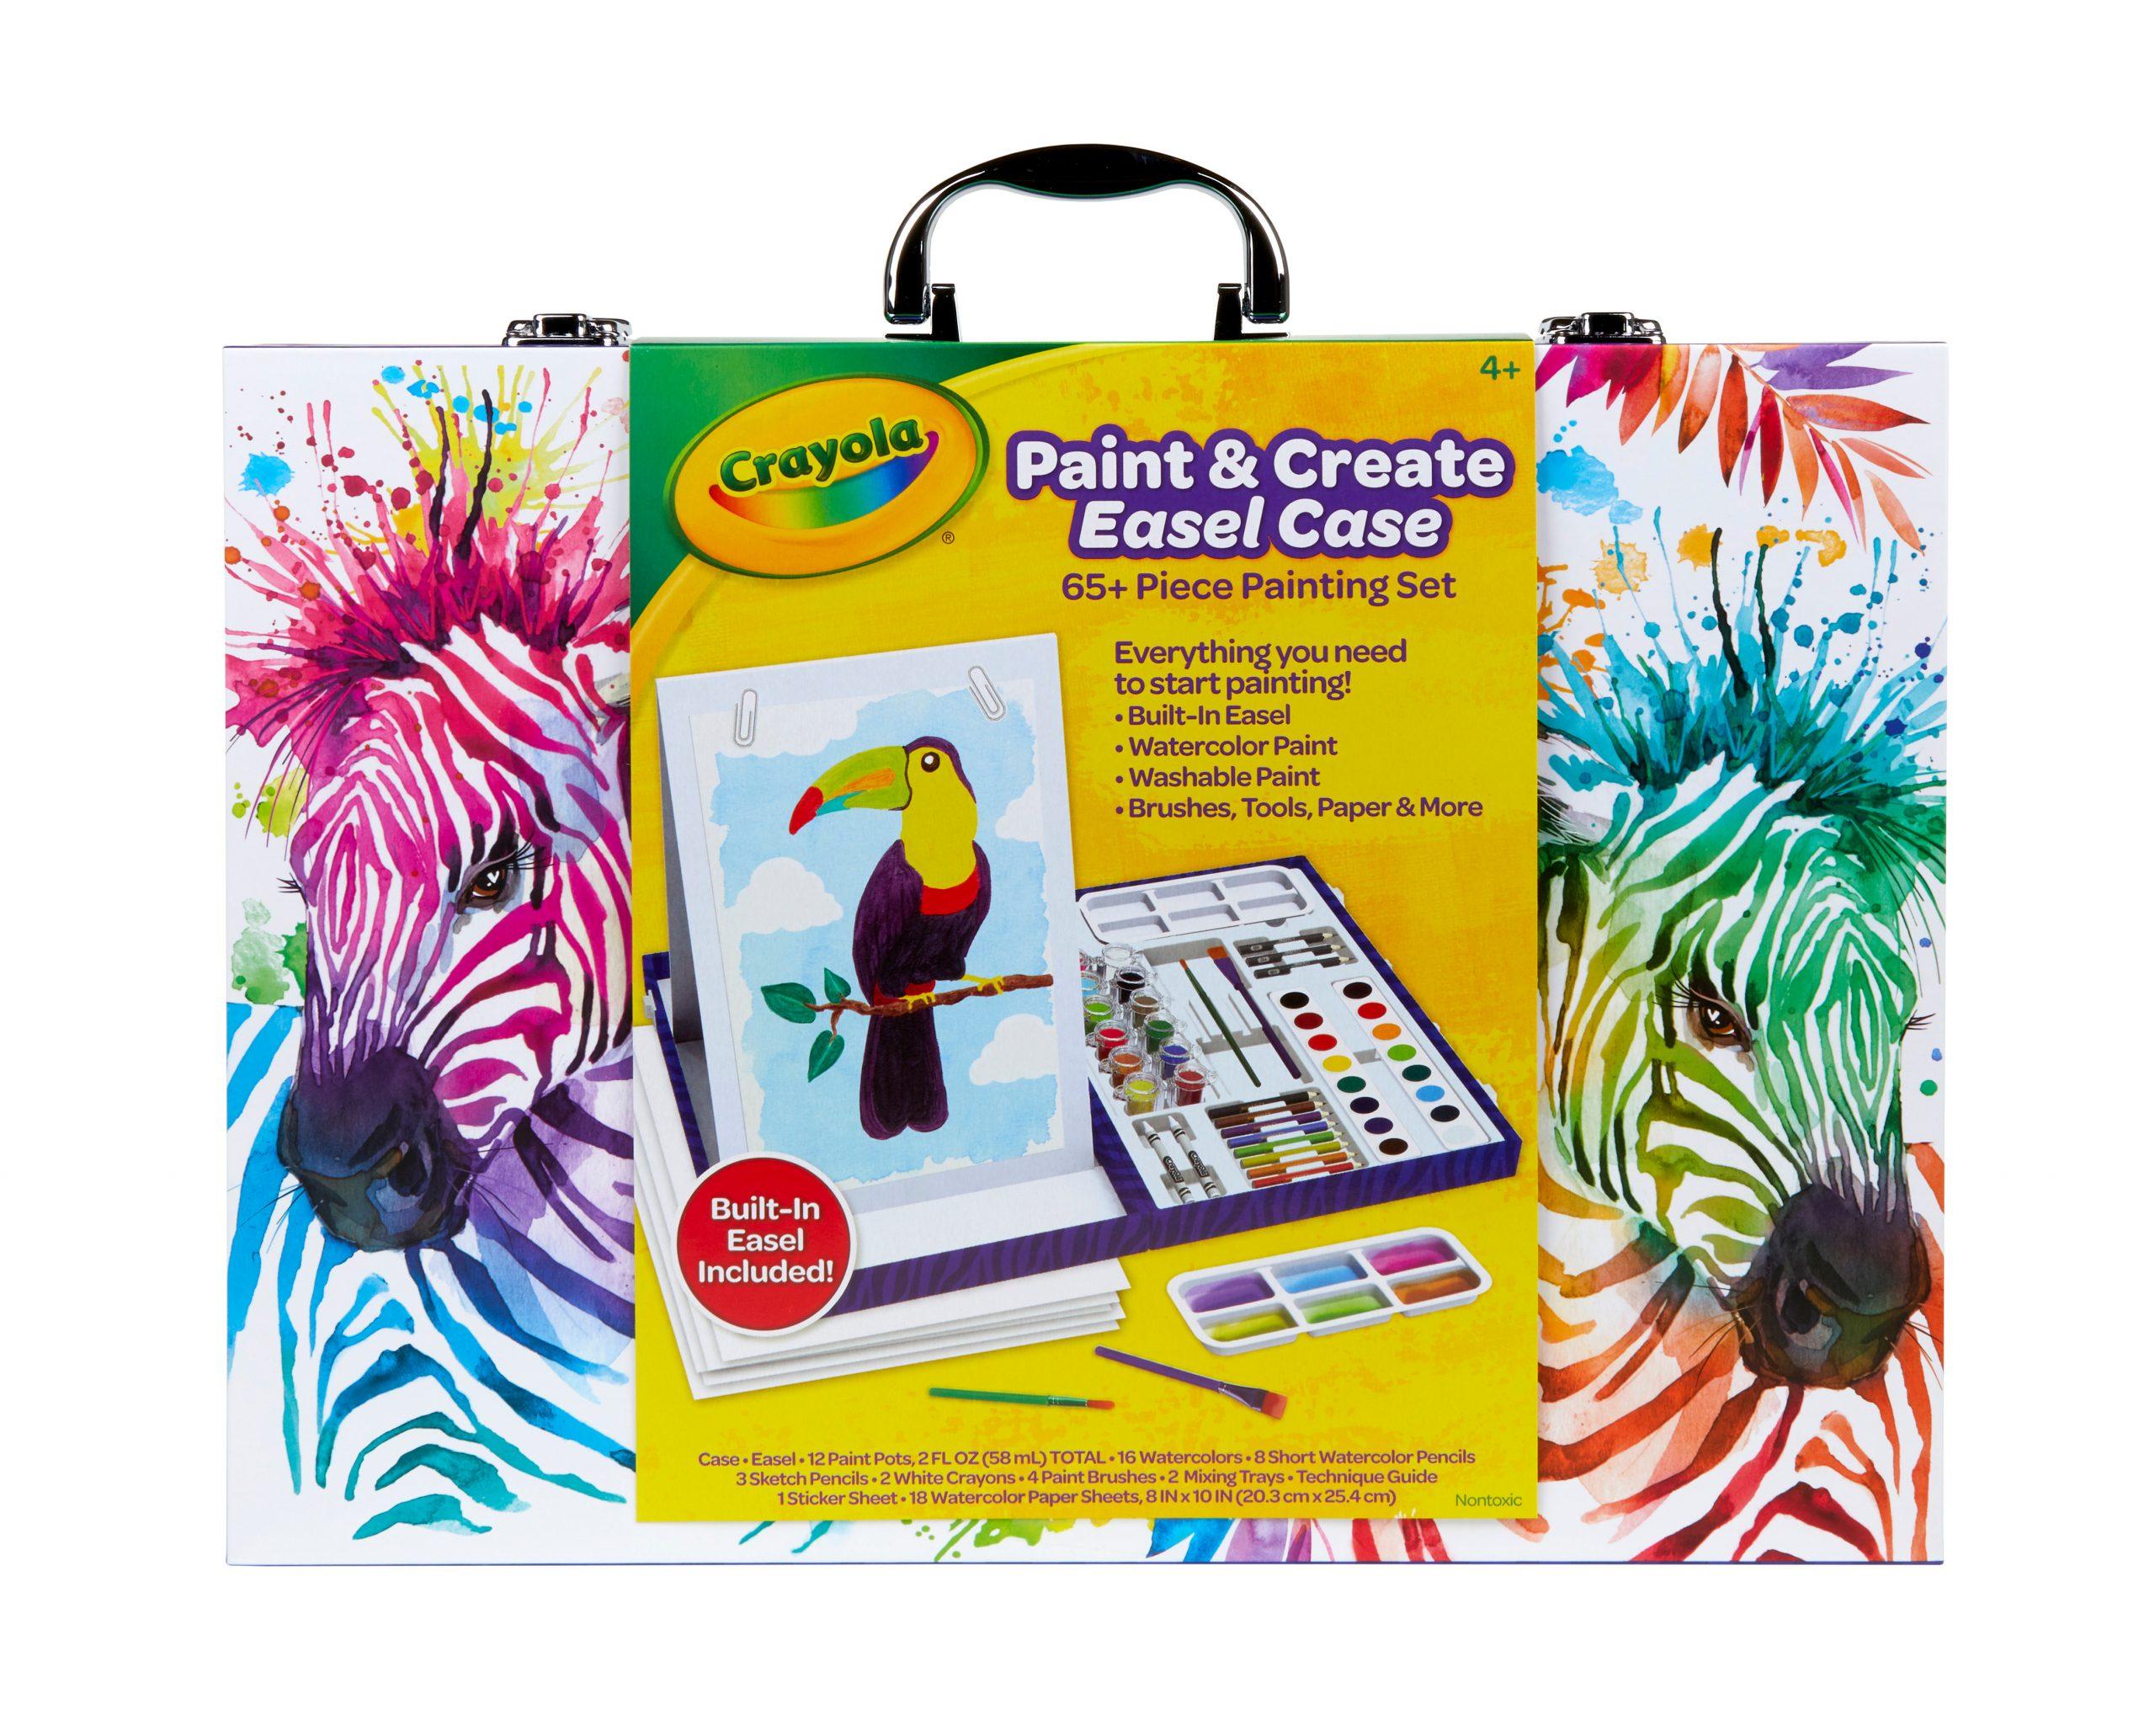 Paint & Create Easel Case